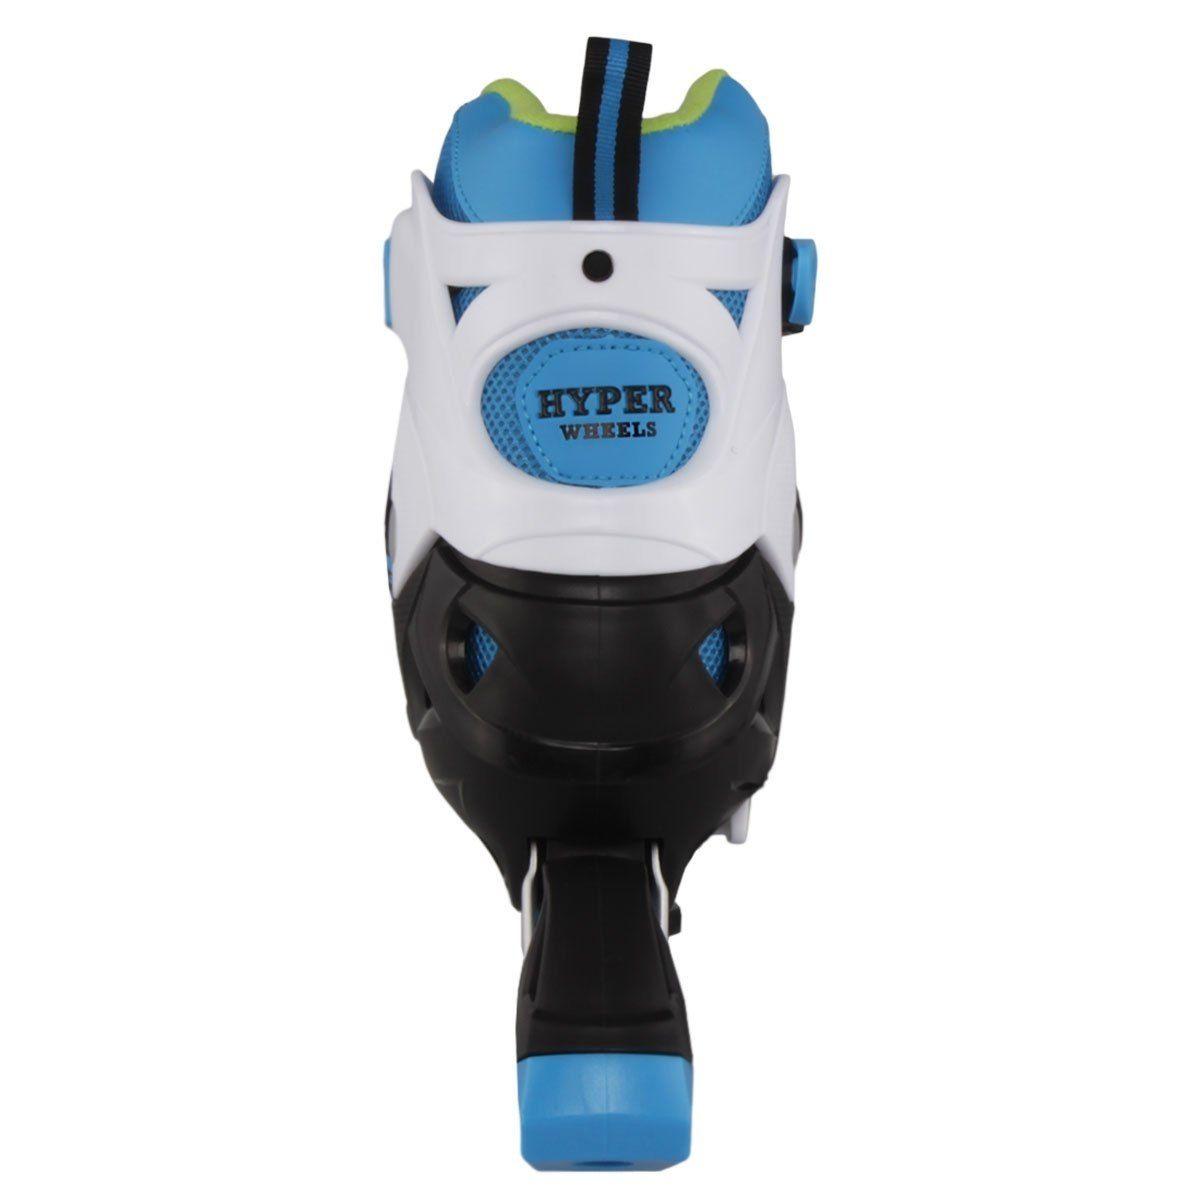 Roller Hyper Sports Regulável 72mm - Azul Bebê - 34 ao 37